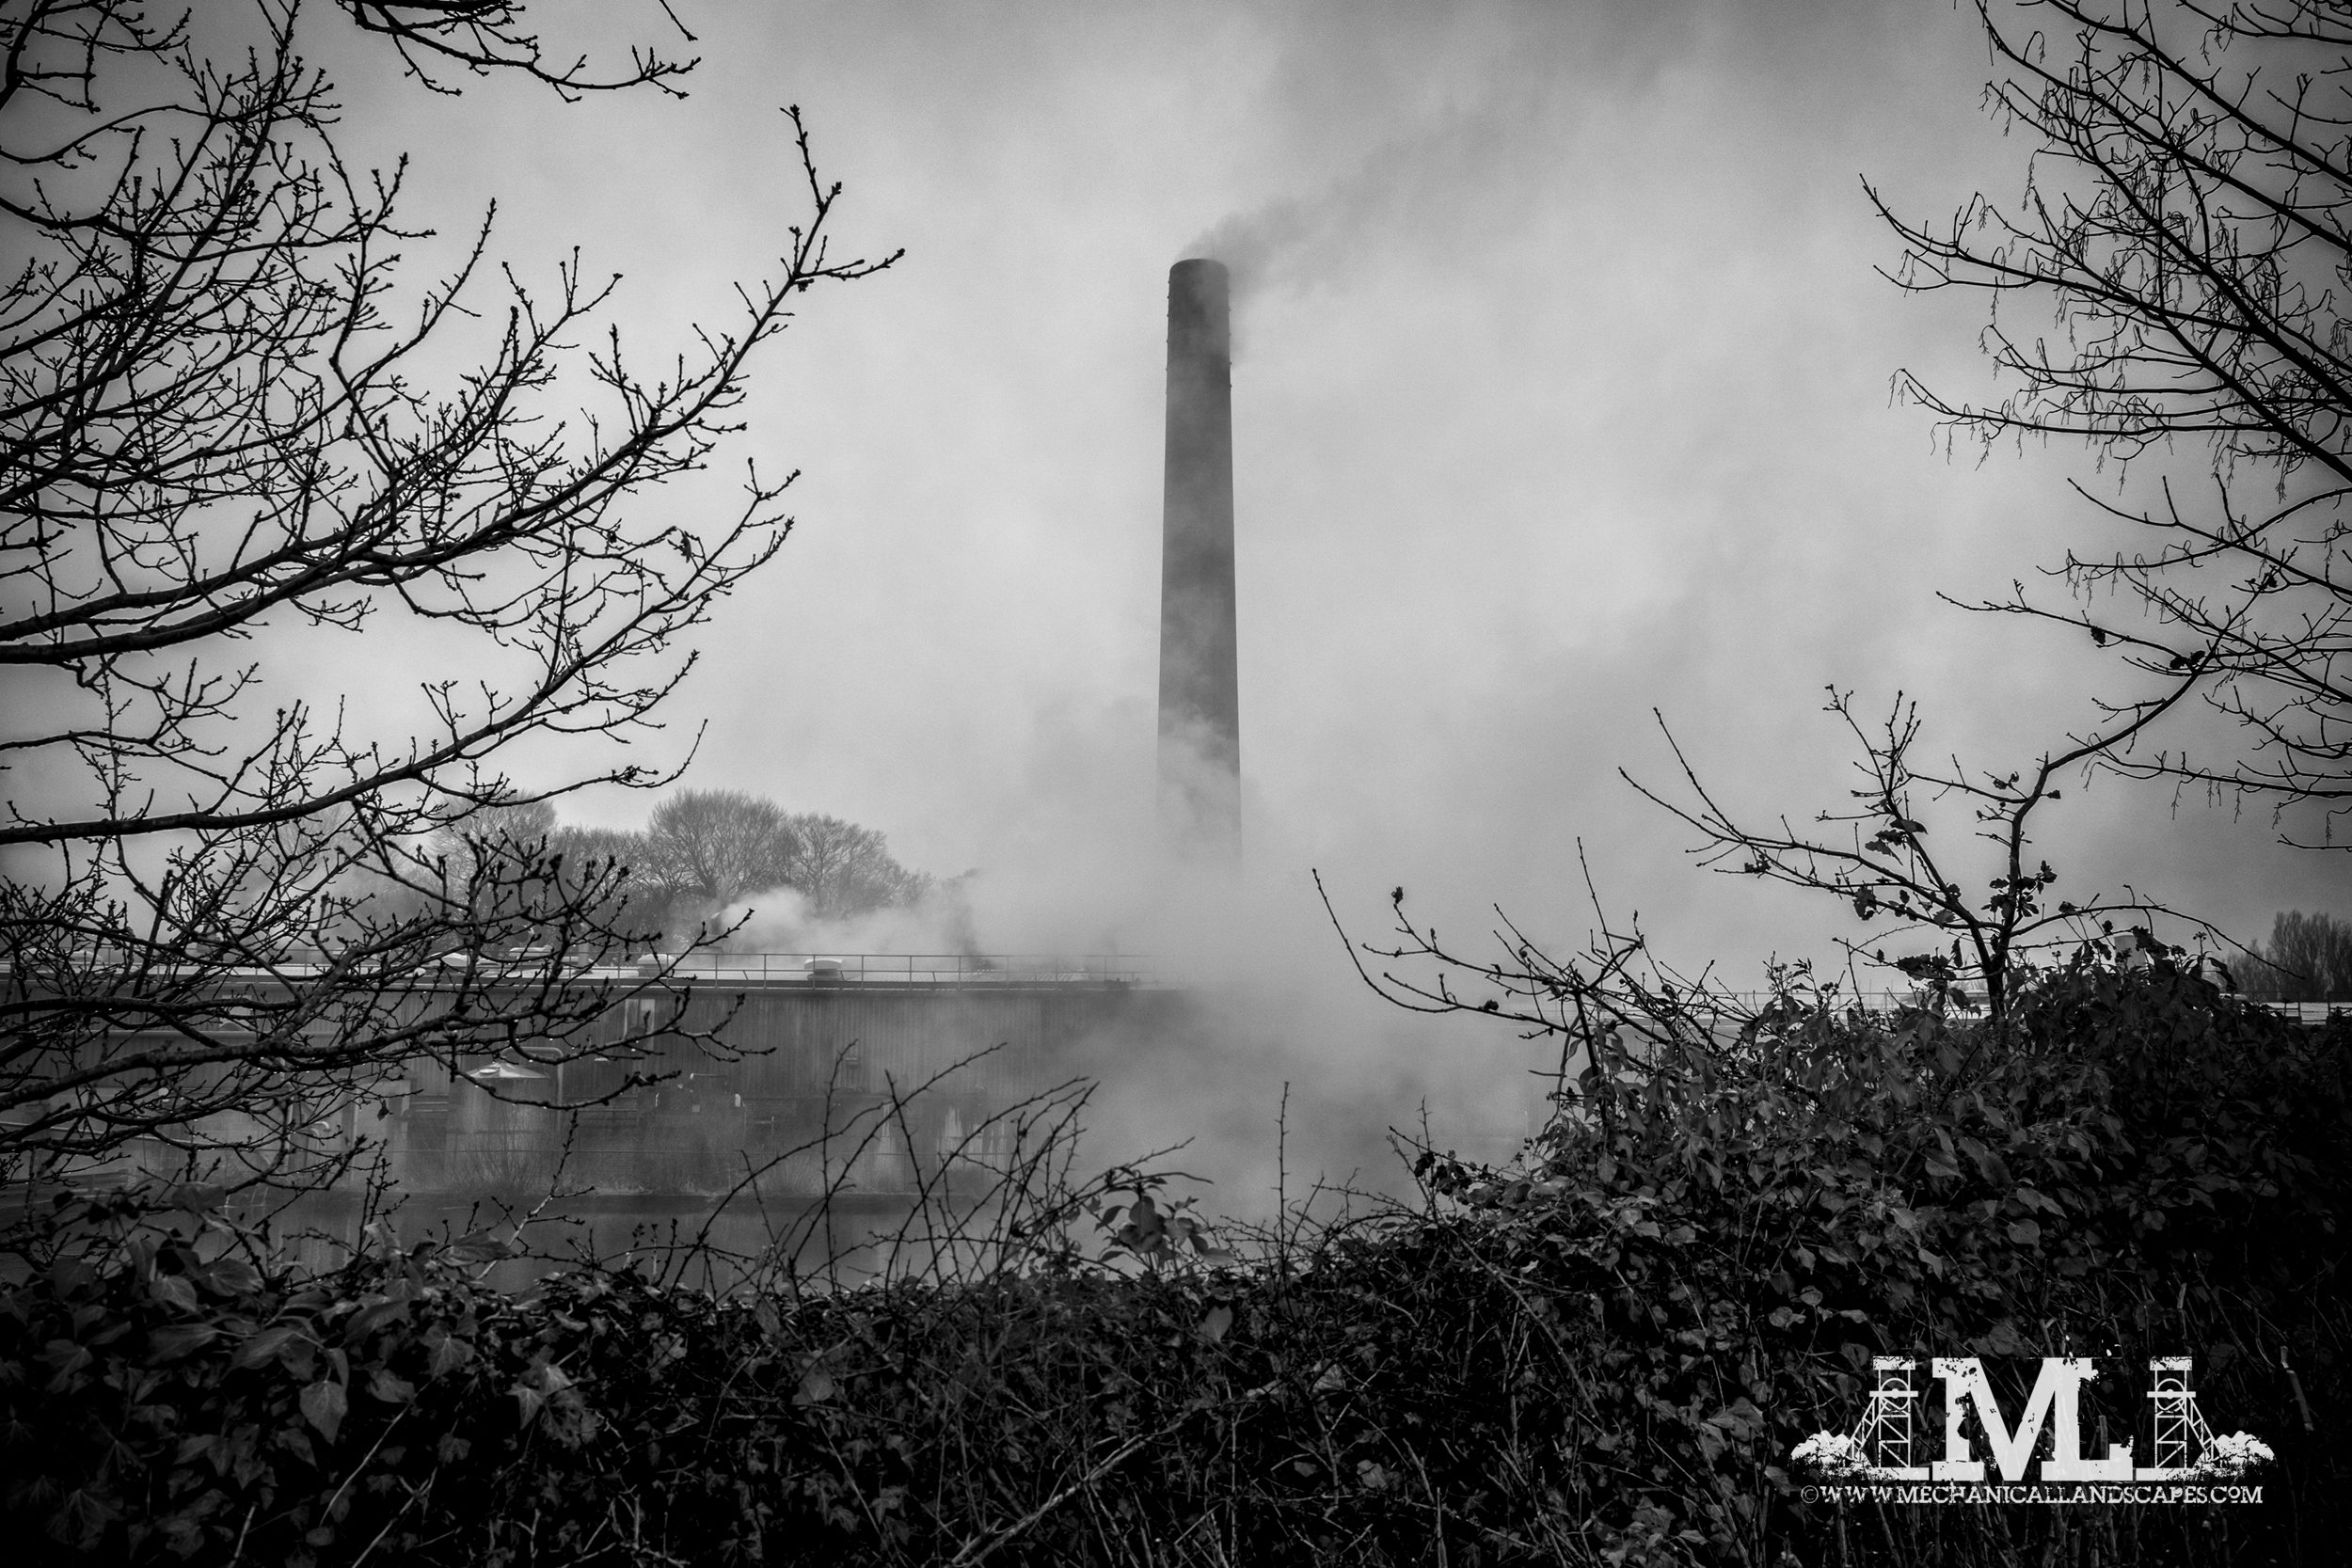 Pincroft Dyers, Adlington